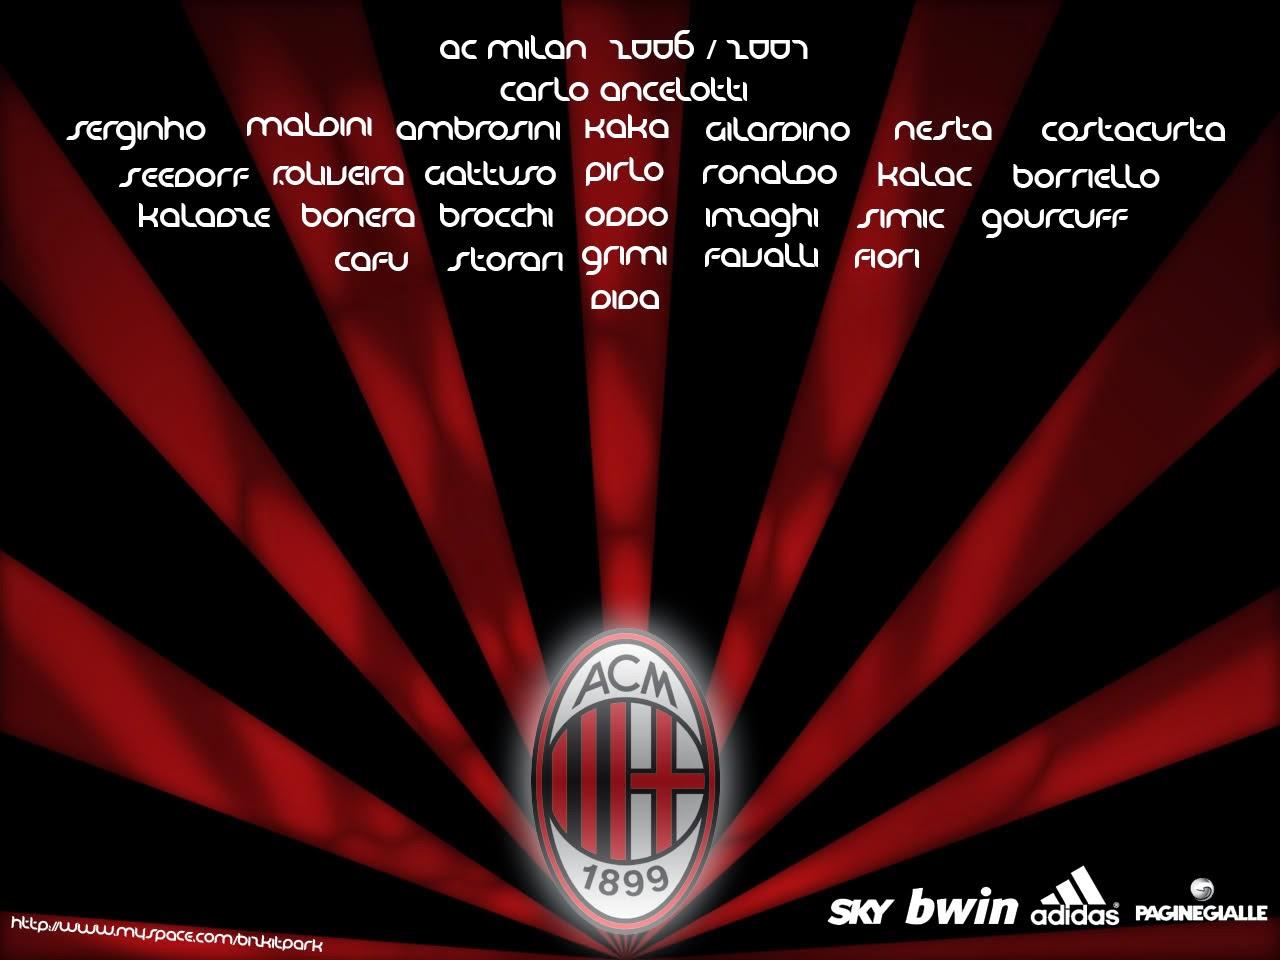 The Fresh Wallpaper Ac Milan Football Club Wallpaper